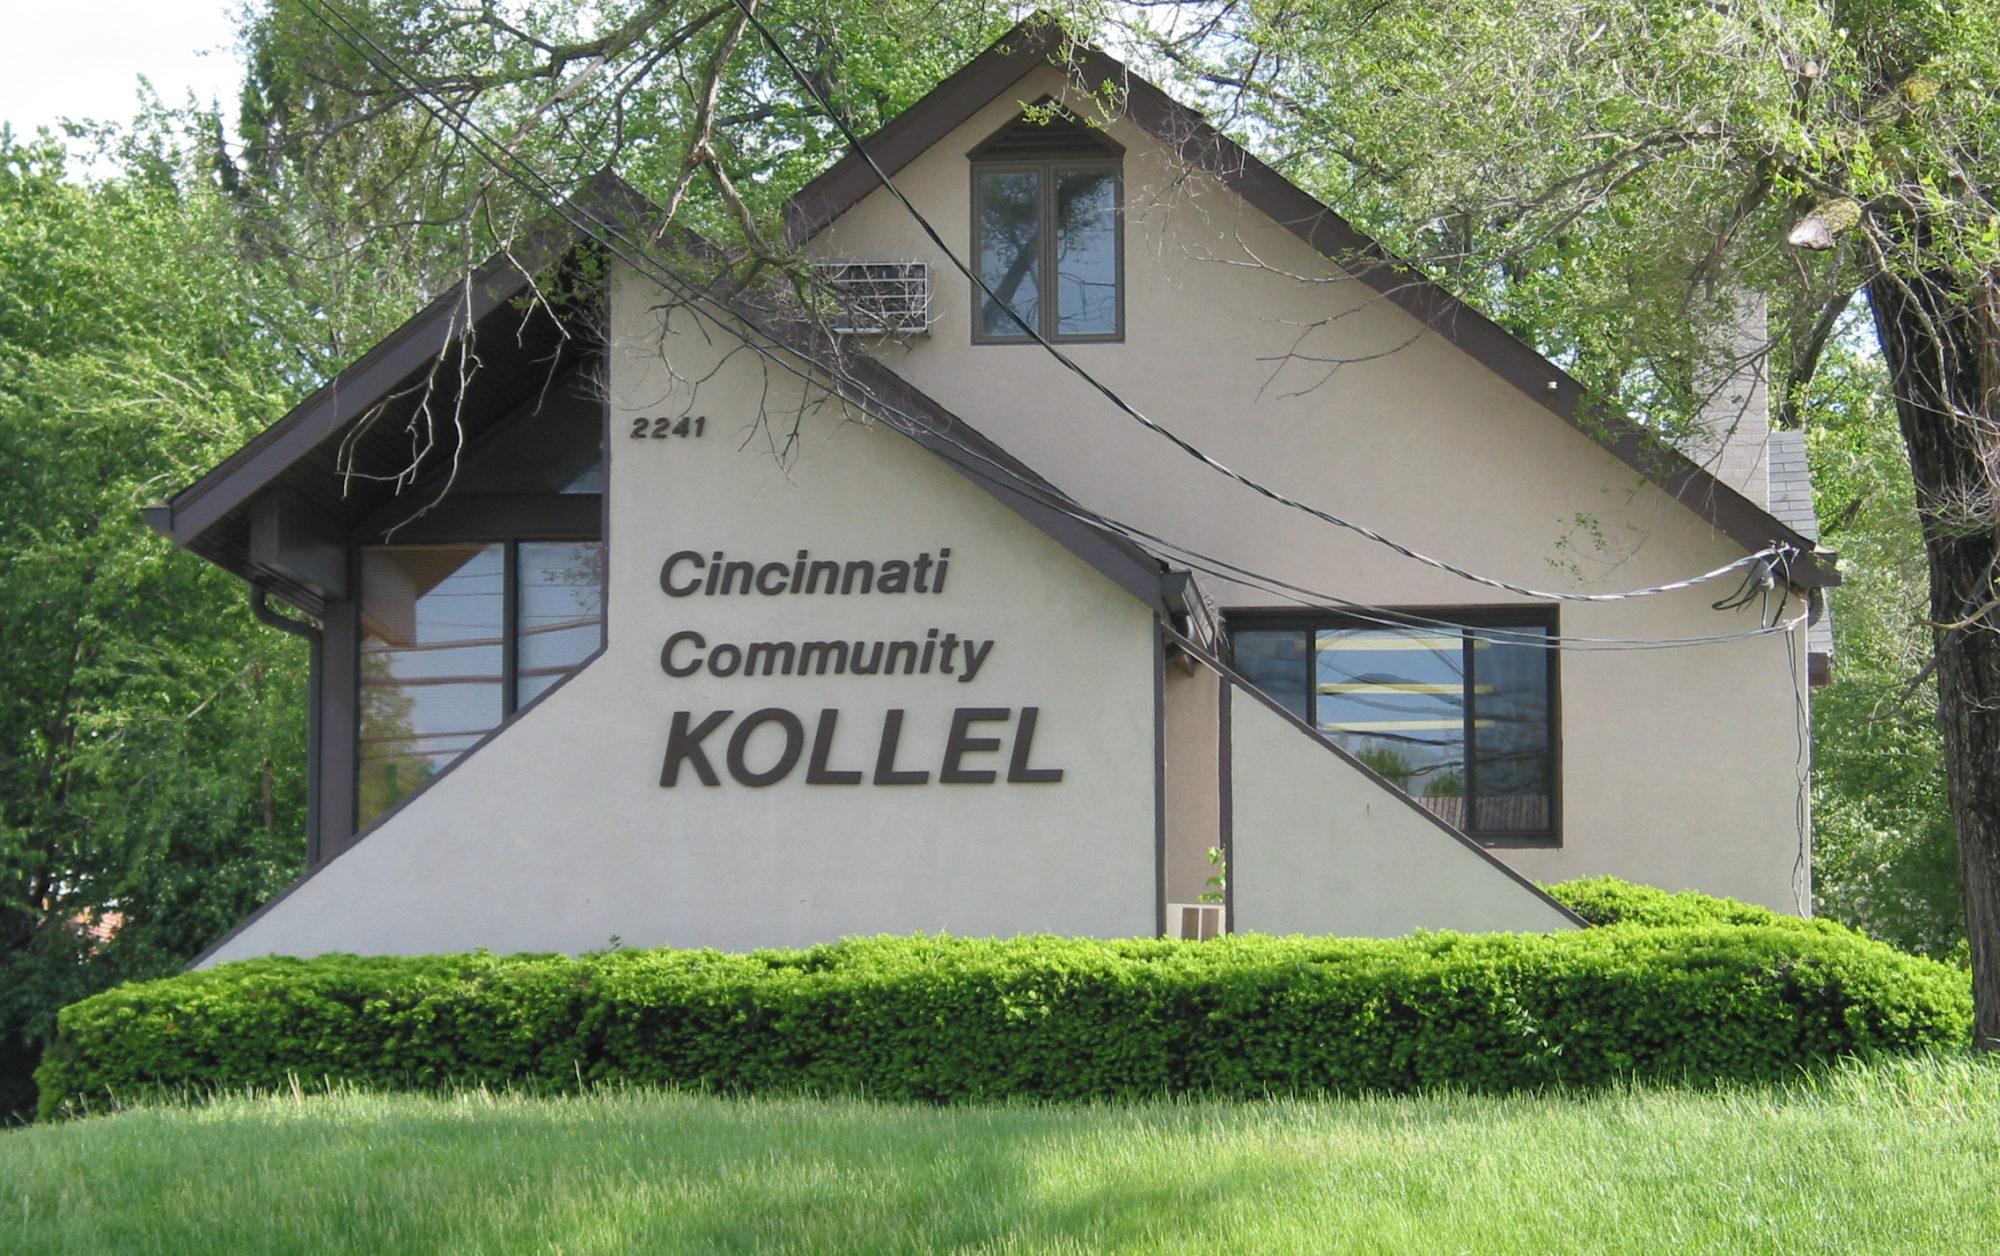 Cincinnati Community Kollel